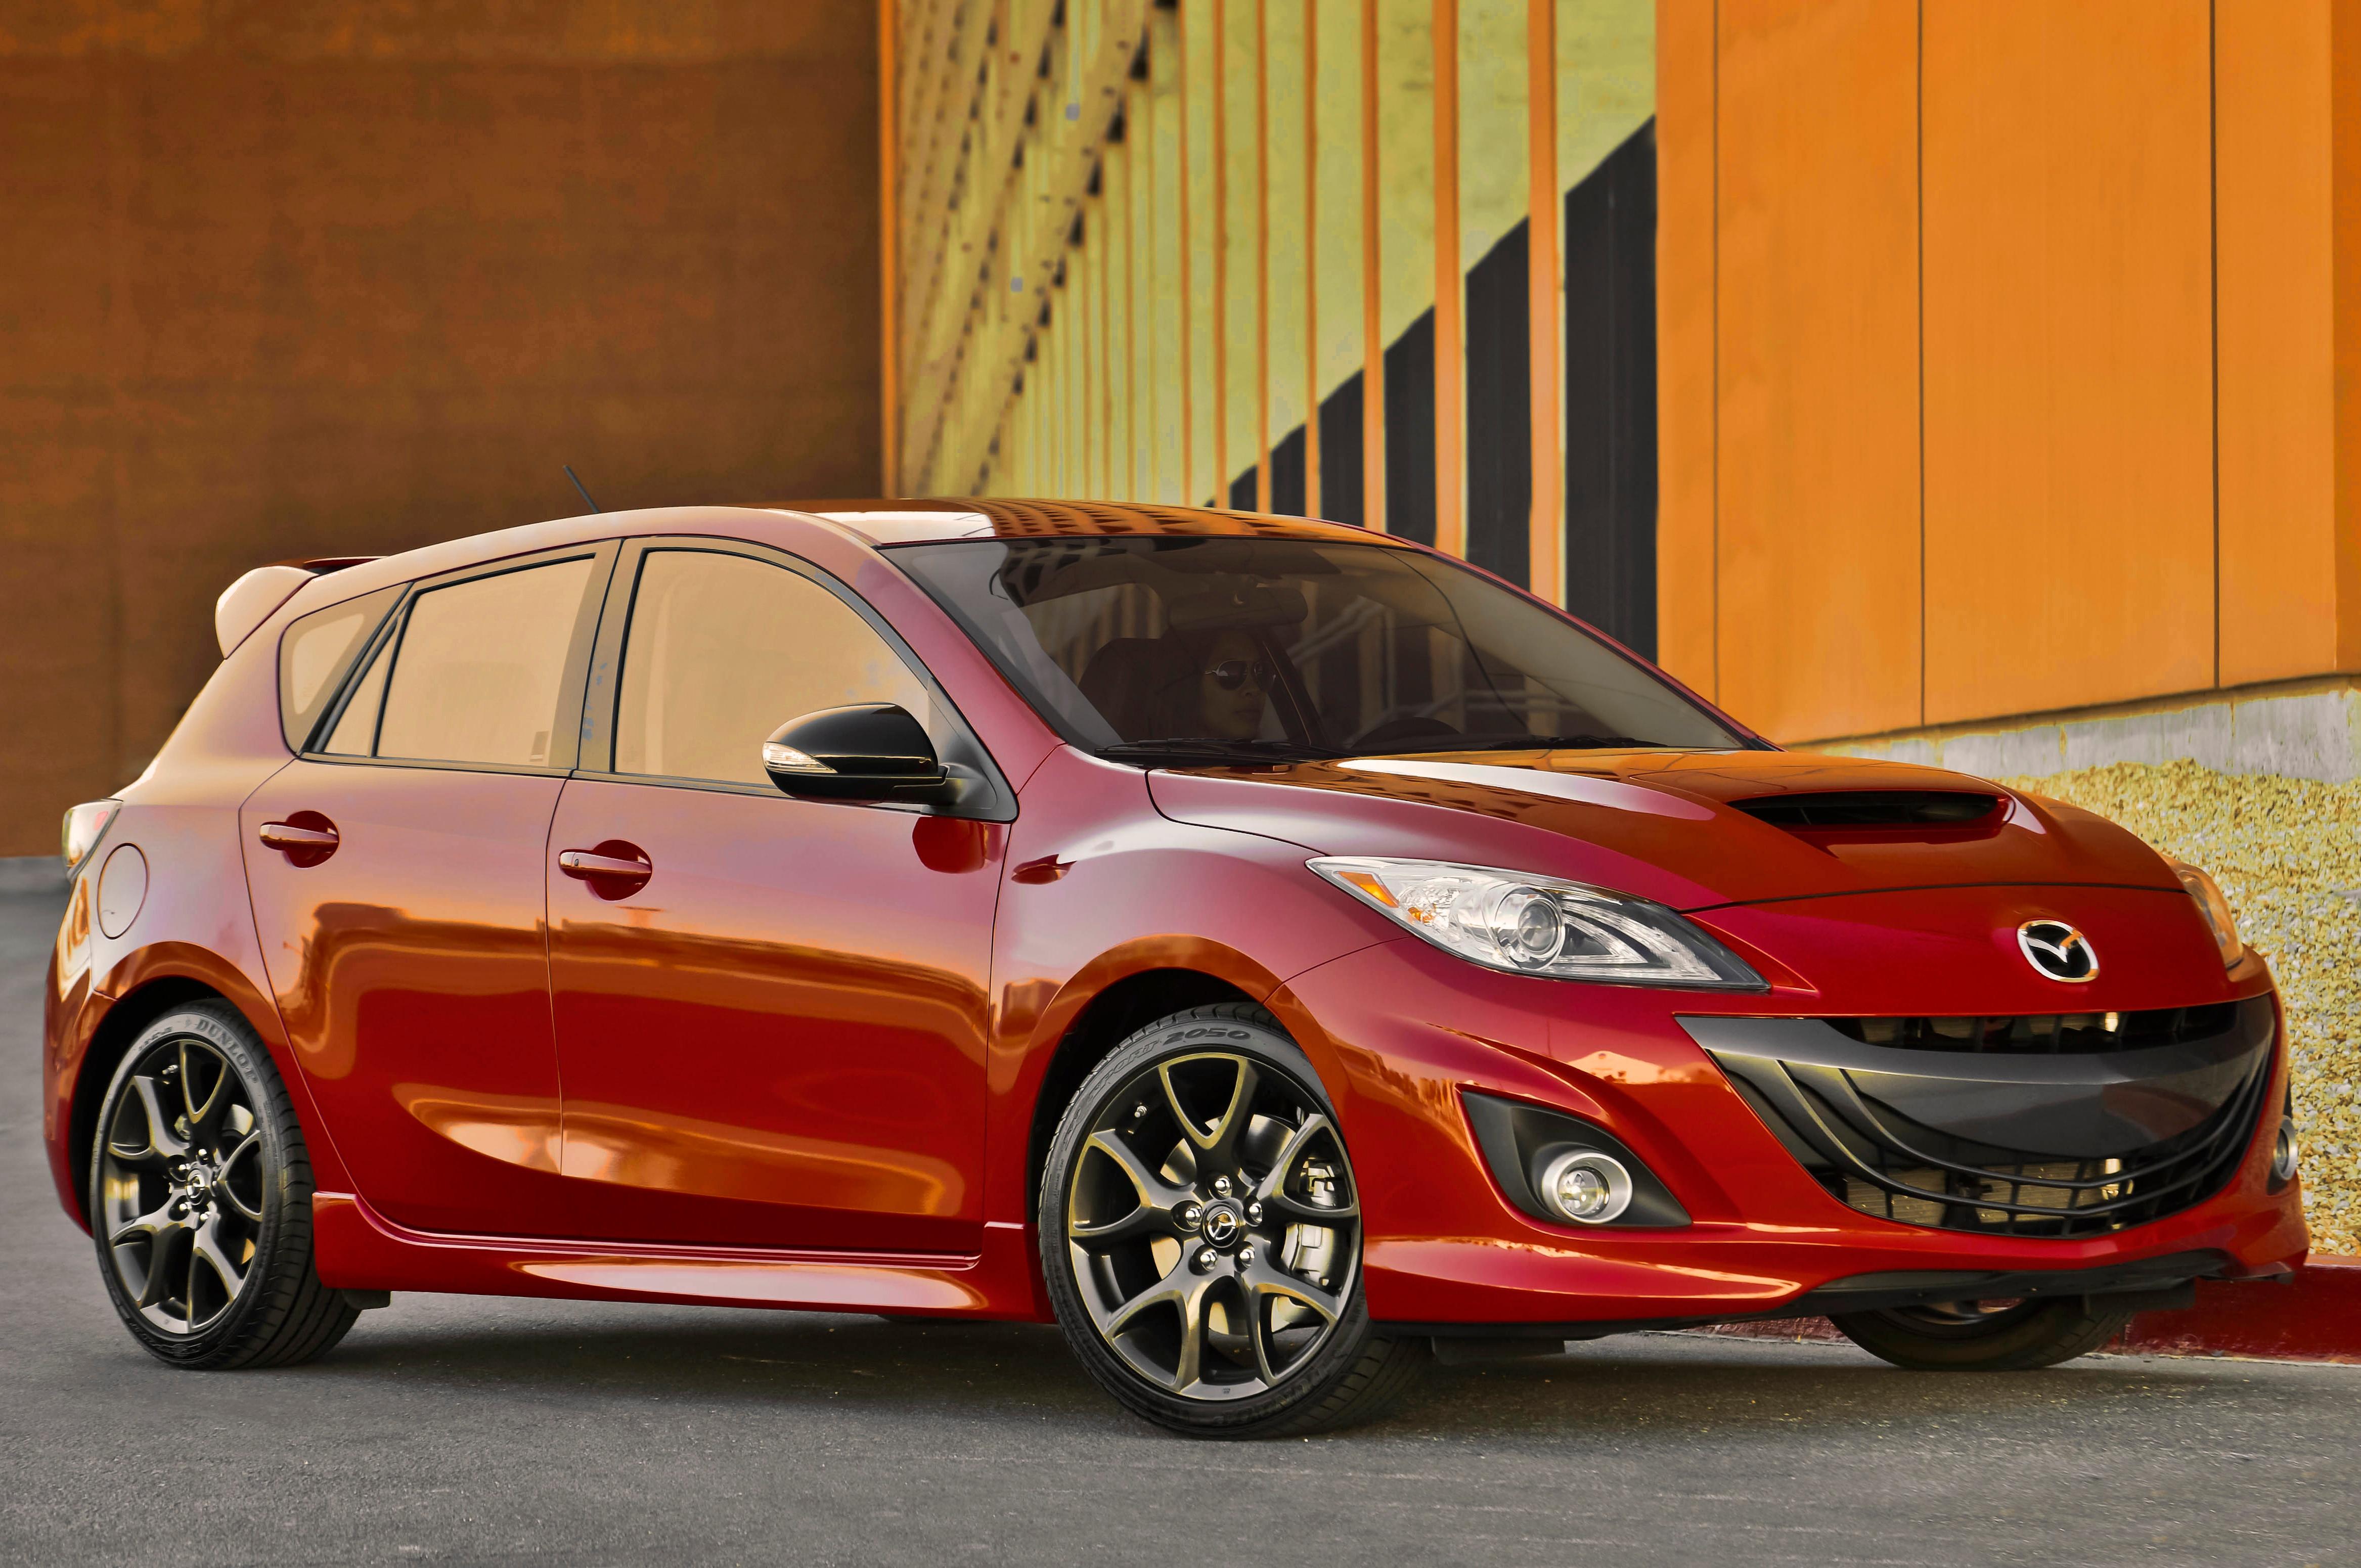 2013 Mazdaspeed 3 Front Three Quarters1